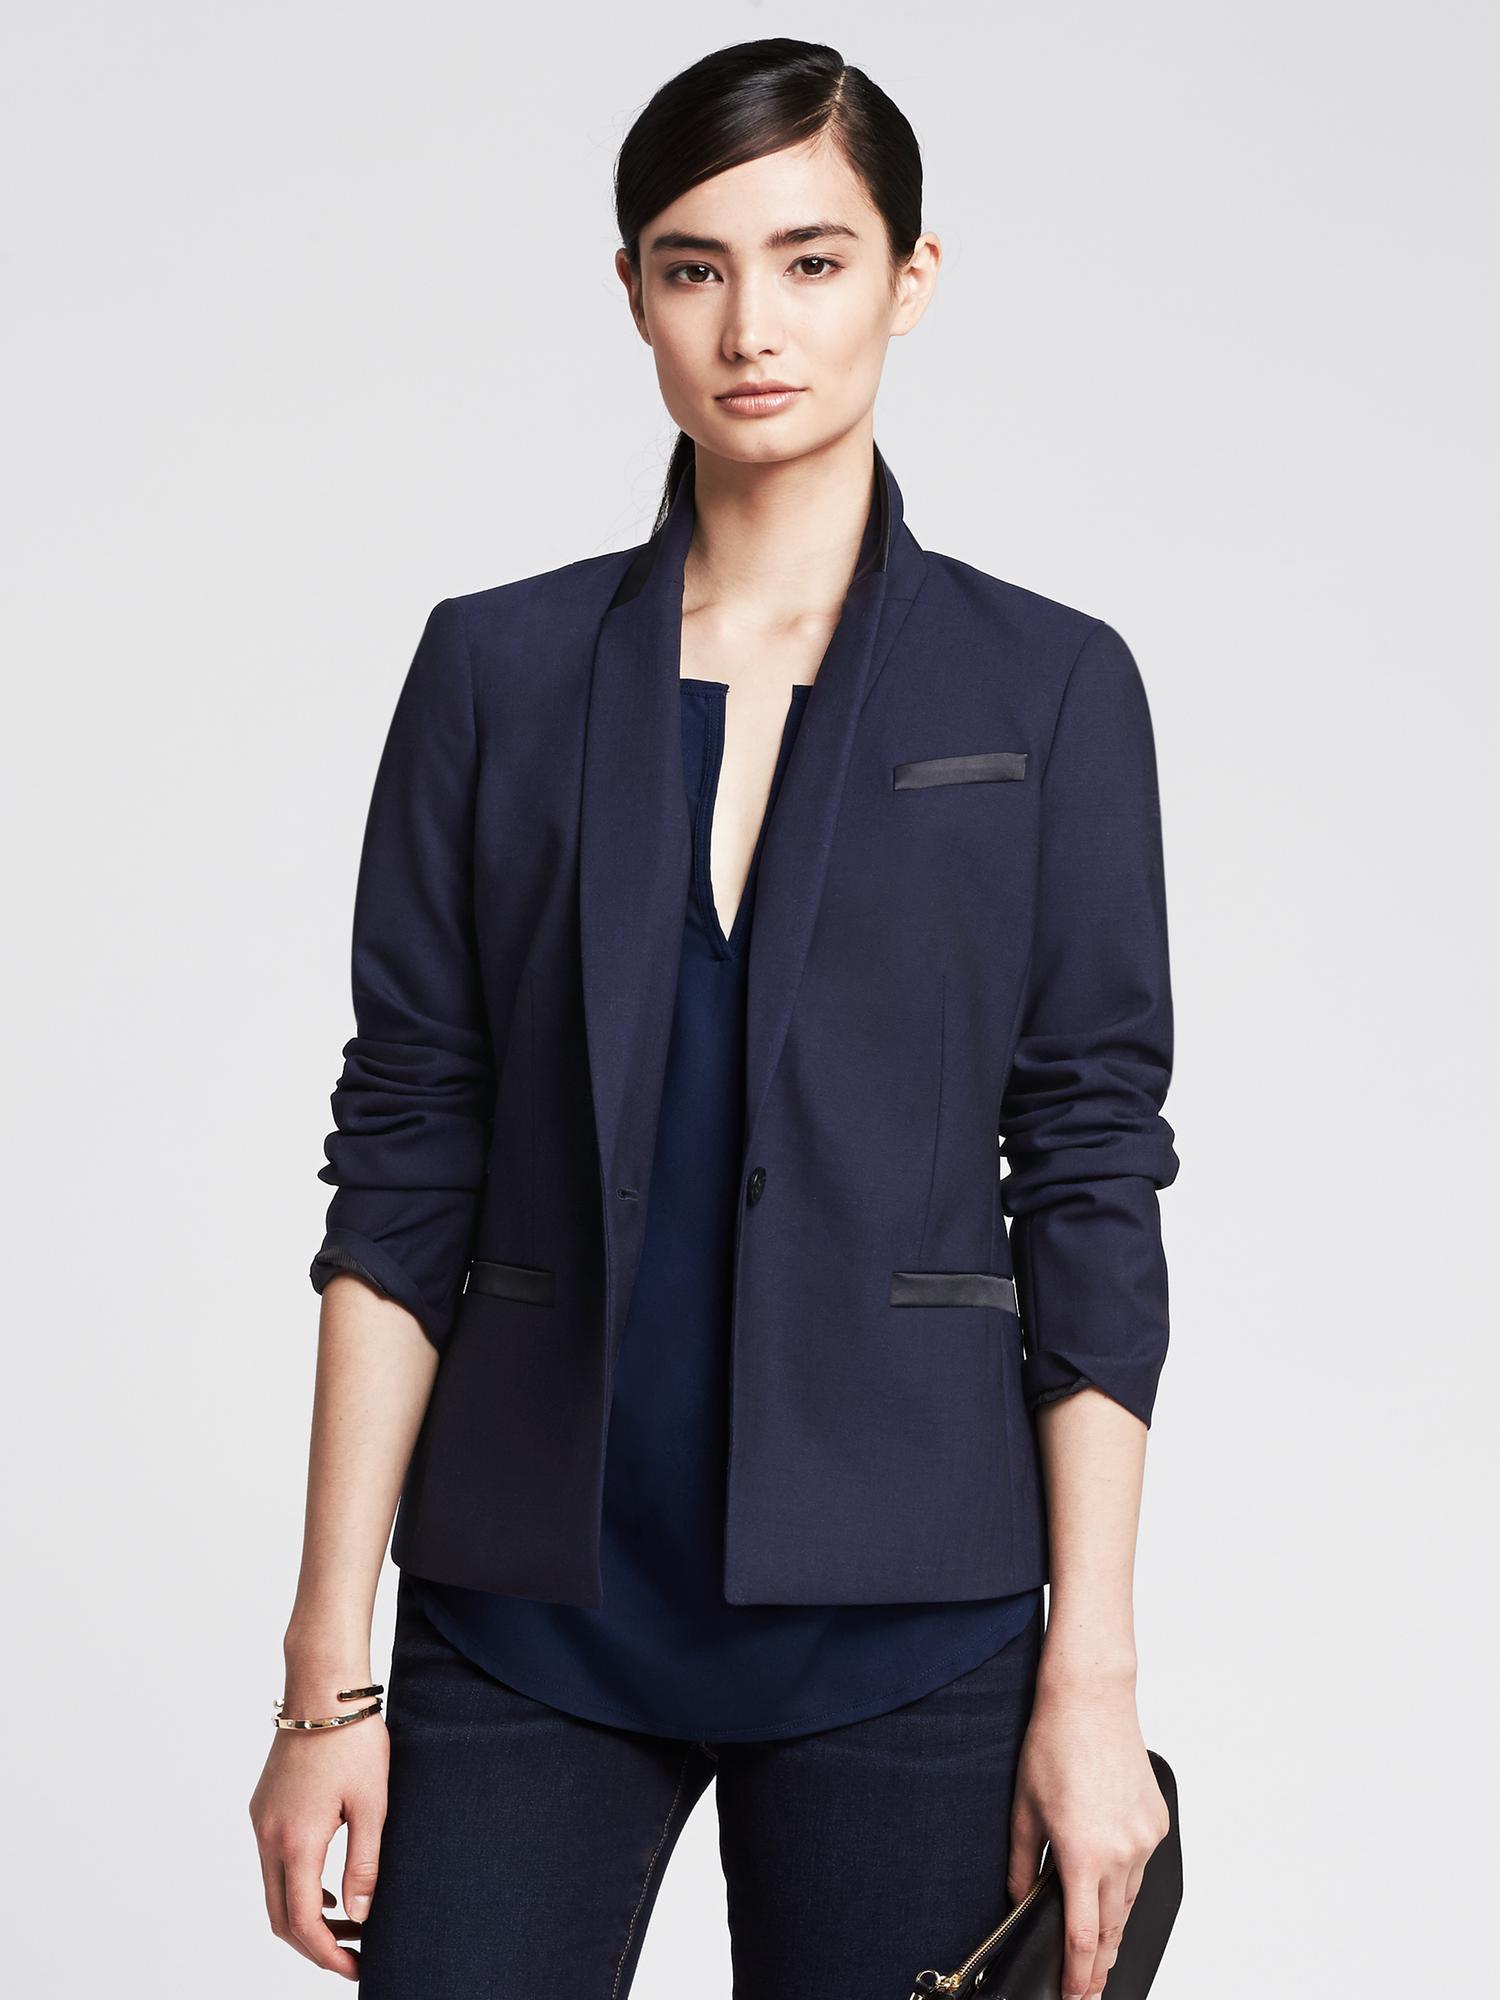 6662a15c2c9 Banana Republic Navy Lightweight Wool Tuxedo Blazer in Blue - Lyst